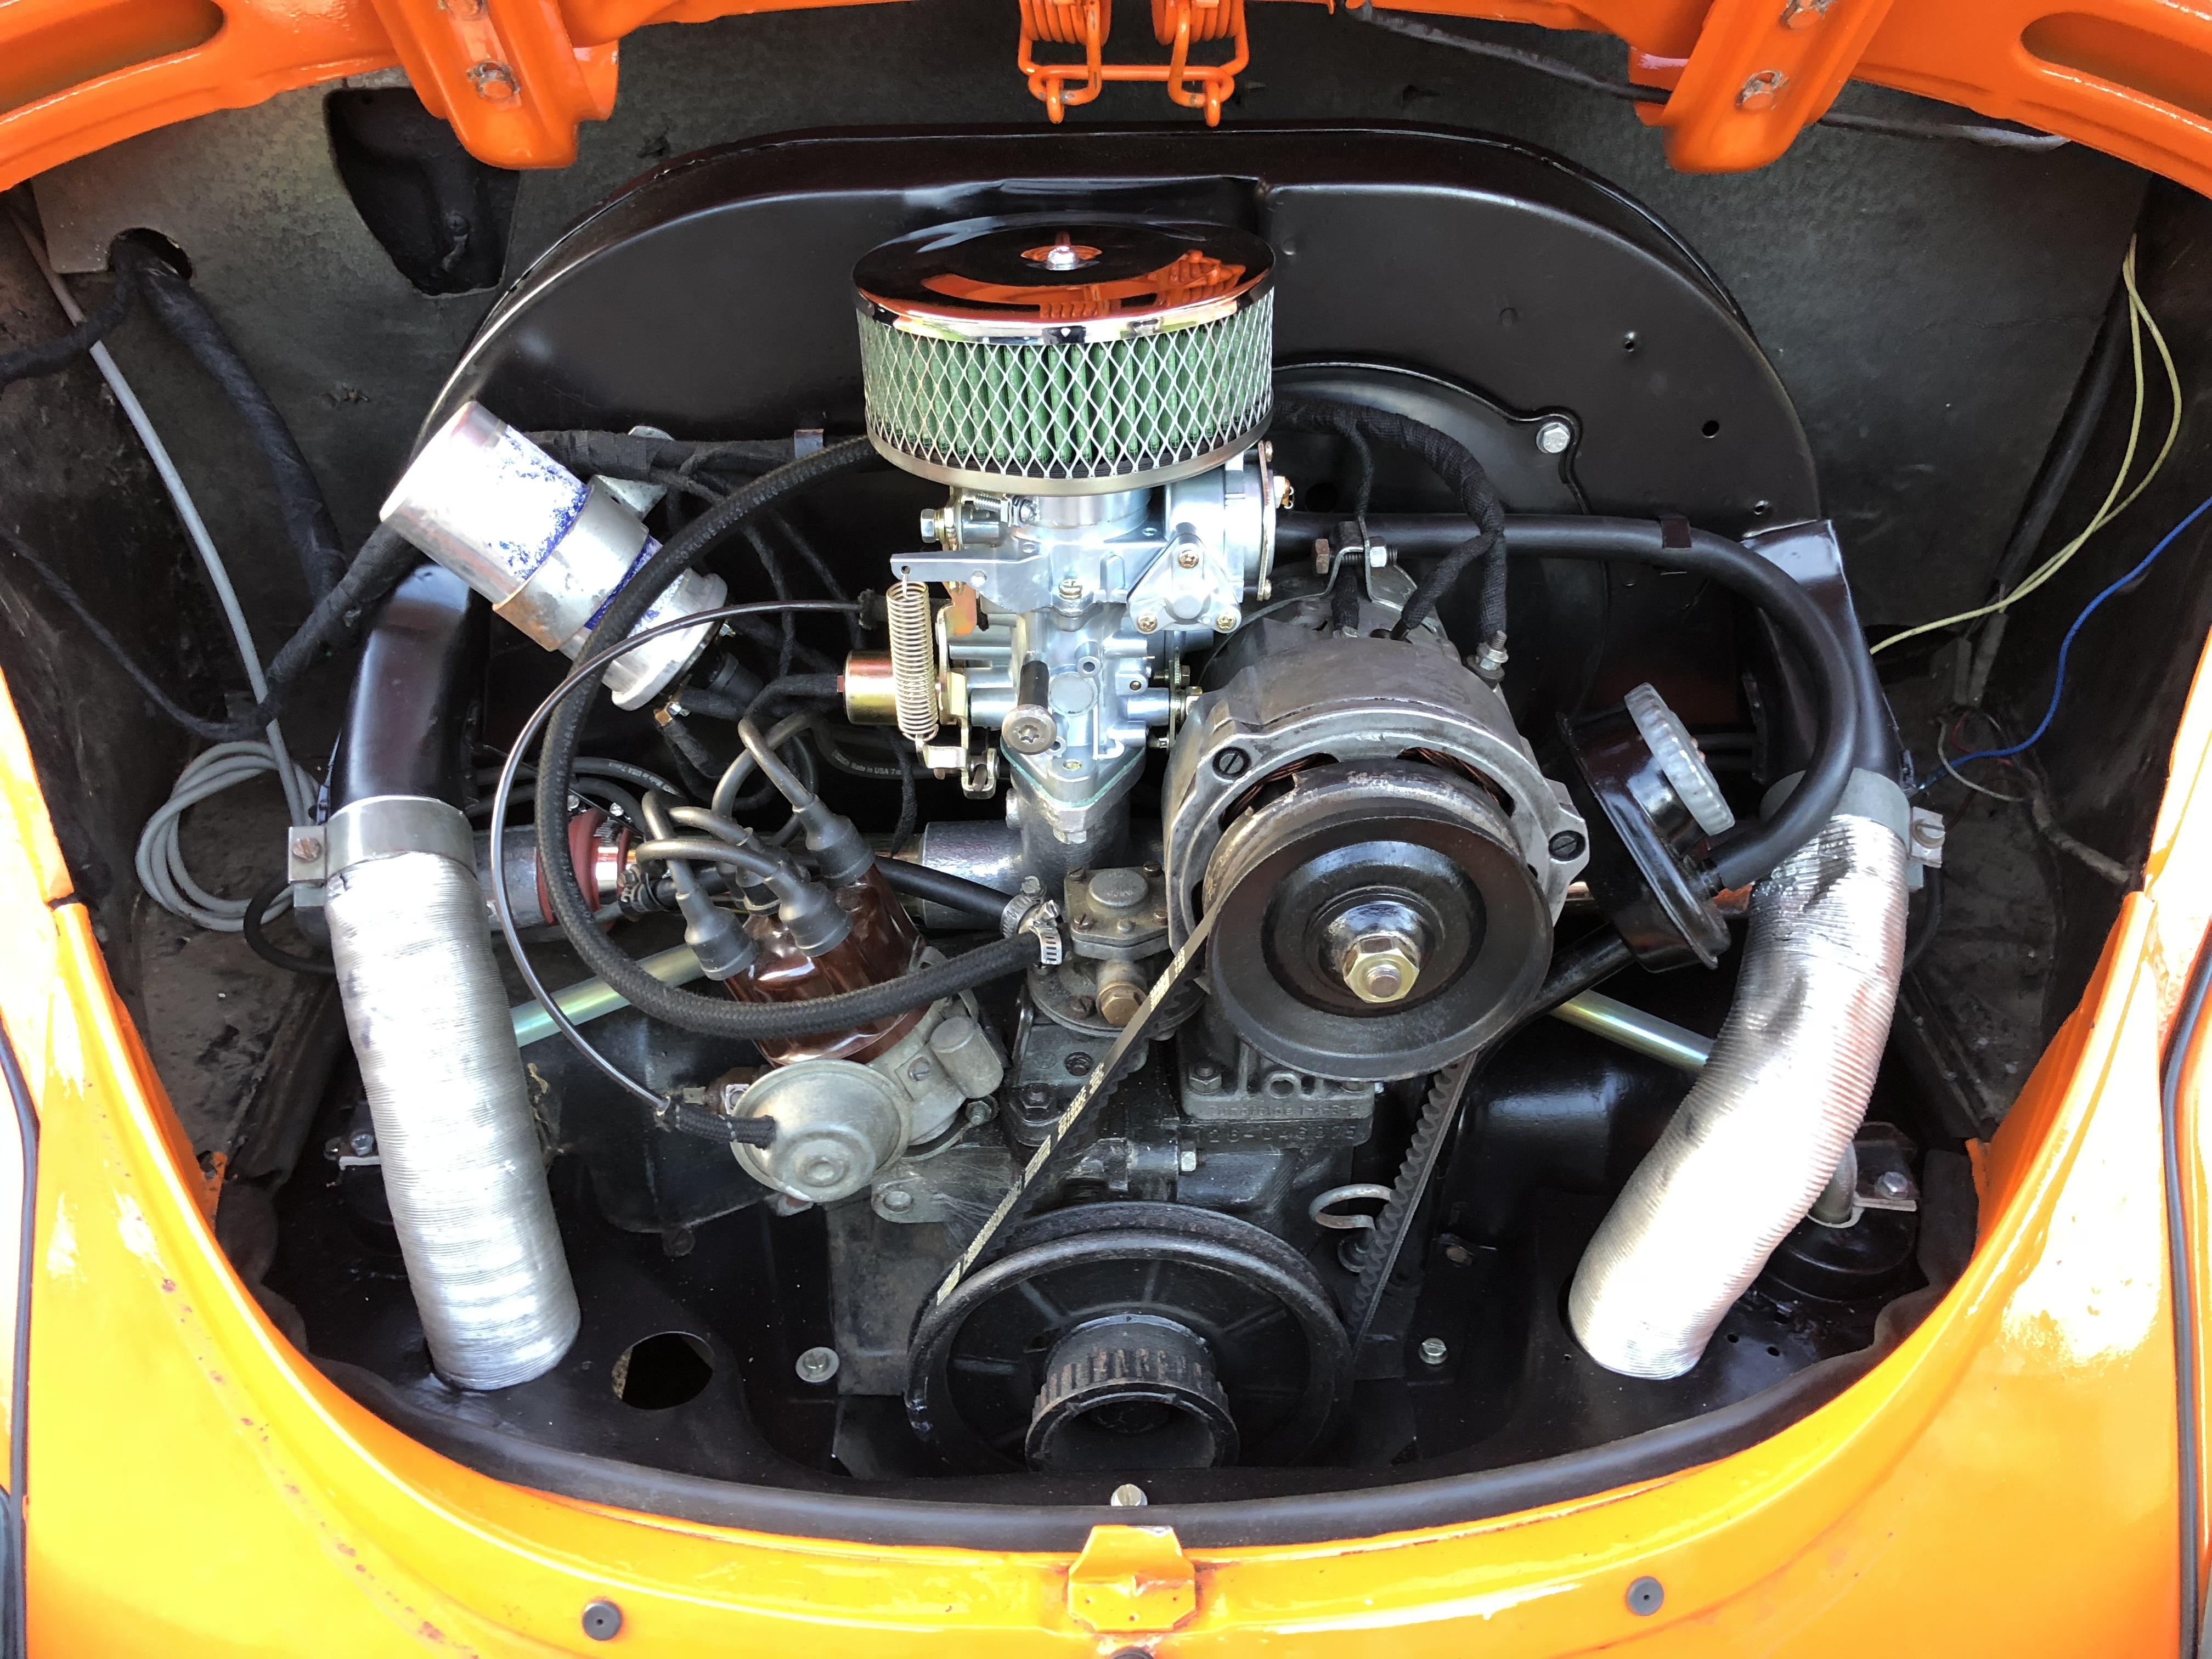 5DF47E4F-8E3E-4BA0-98AA-2AA5D367F4DF.